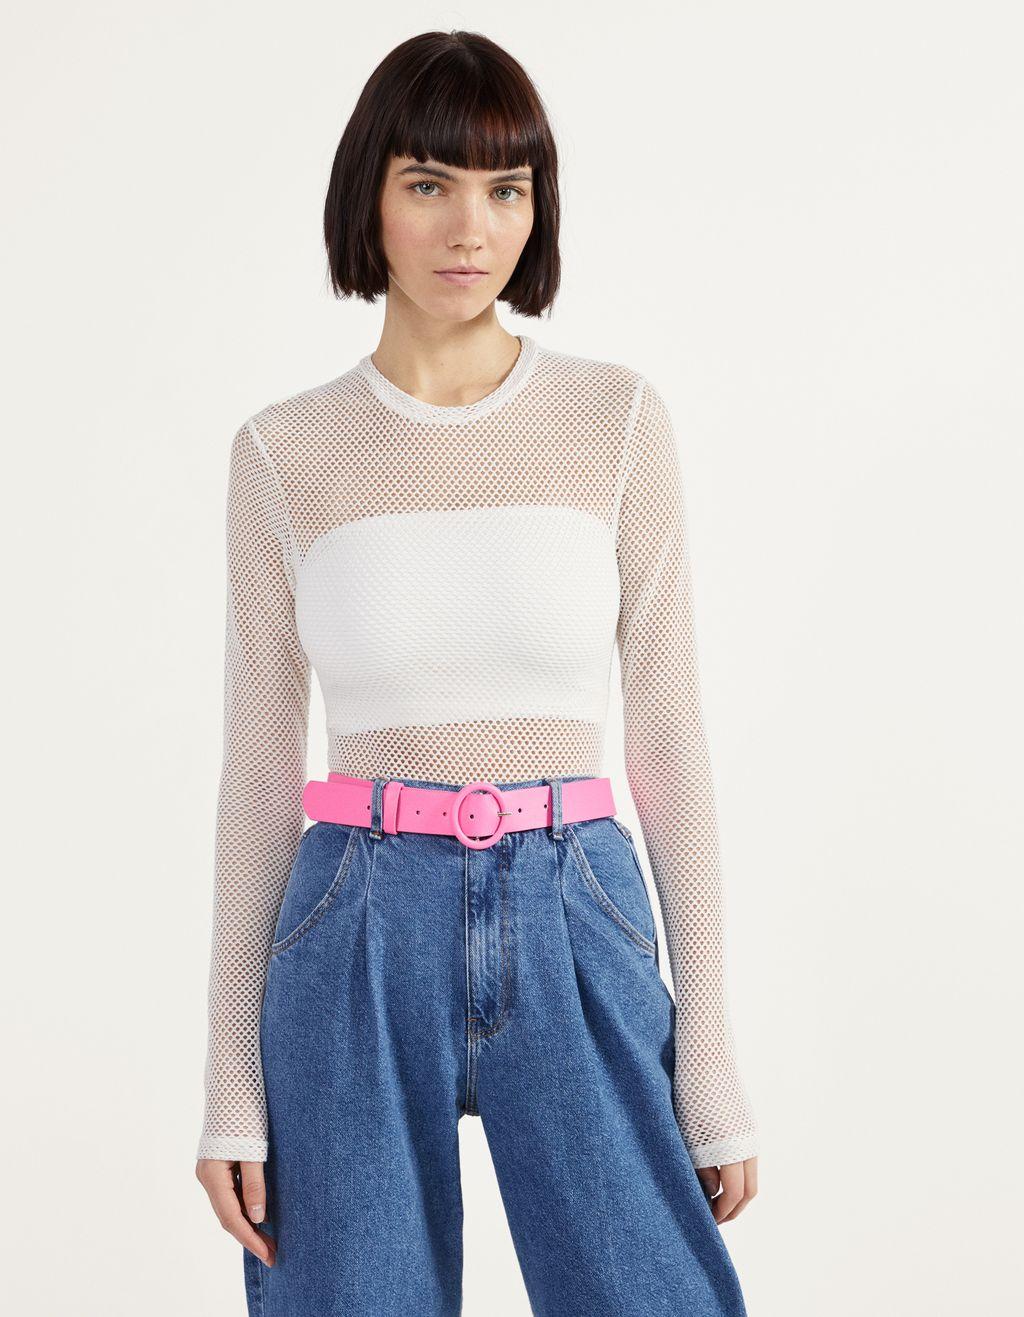 Mesh bodysuit with long sleeves